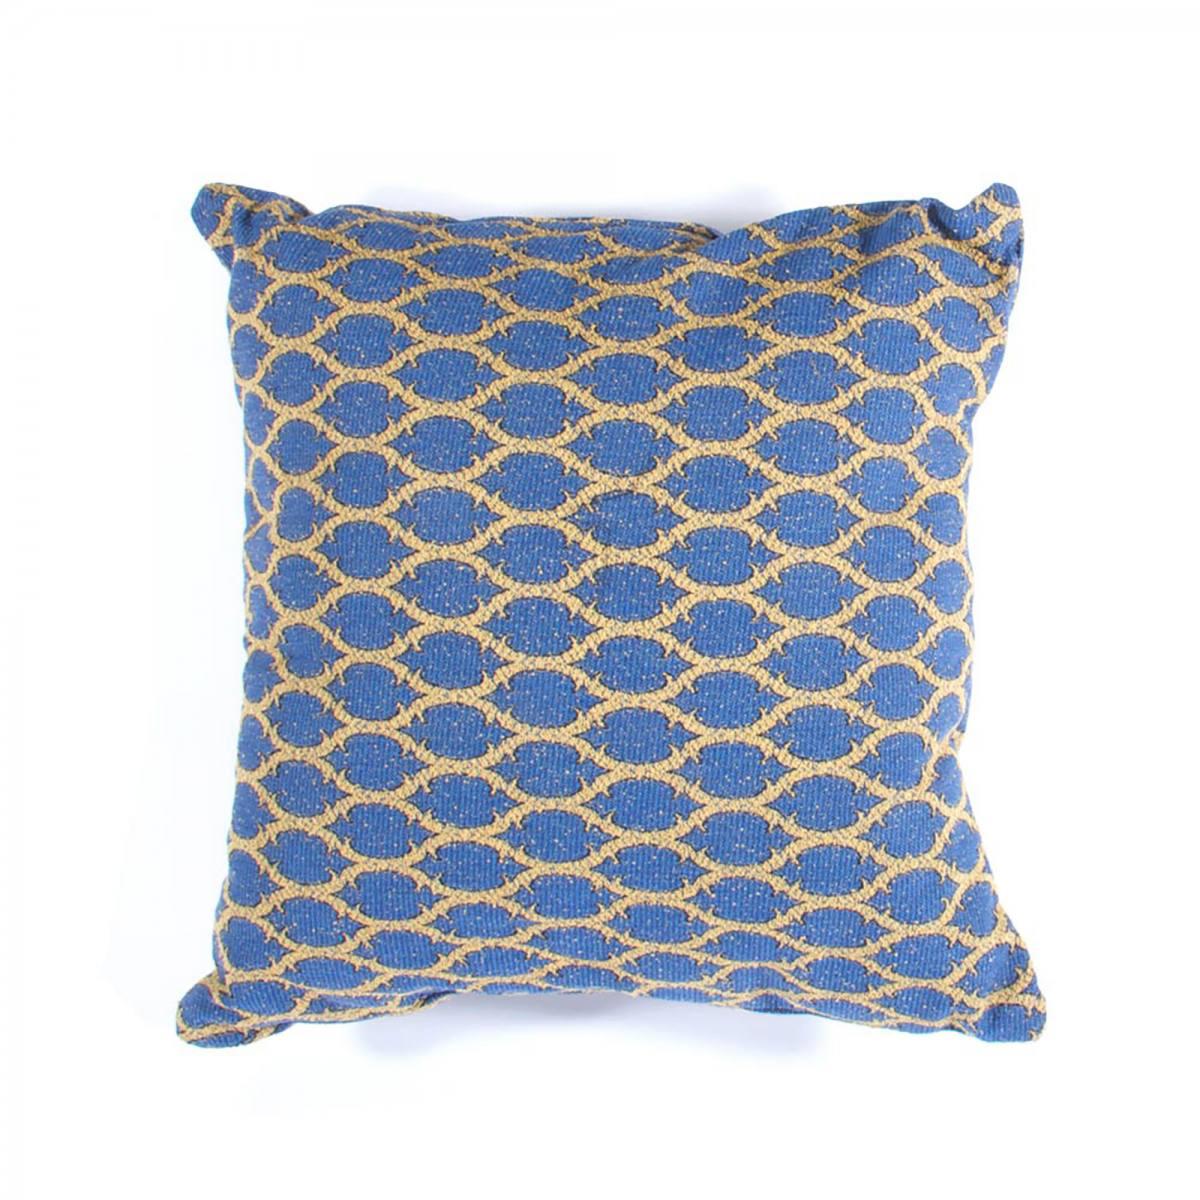 03-20140503-pillow-03